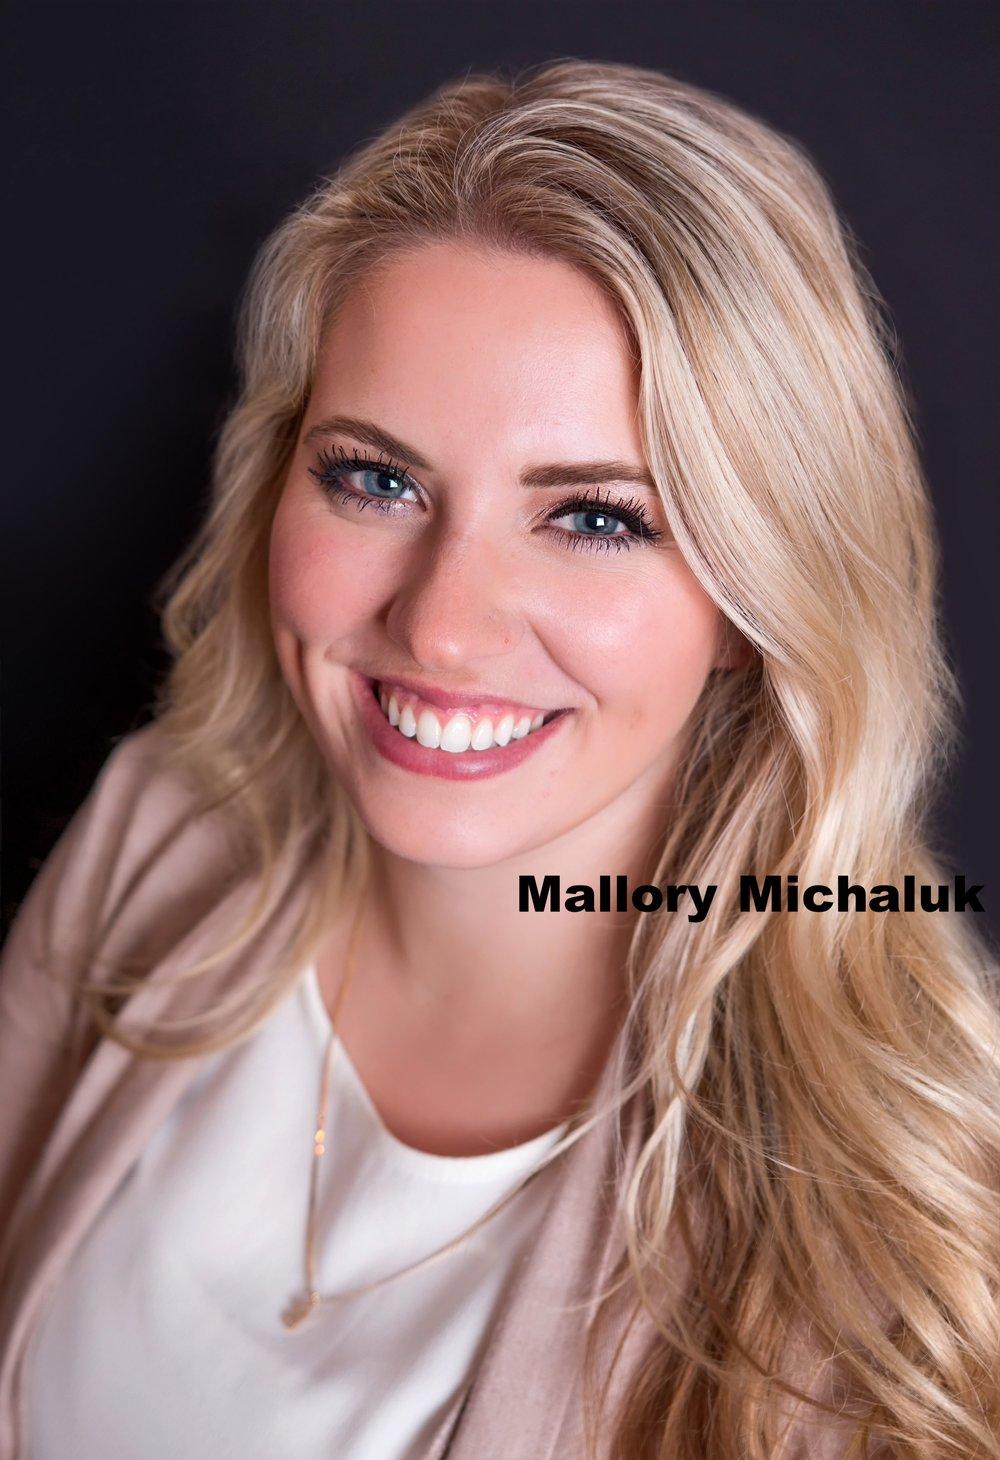 Mallory Michaluk.JPG